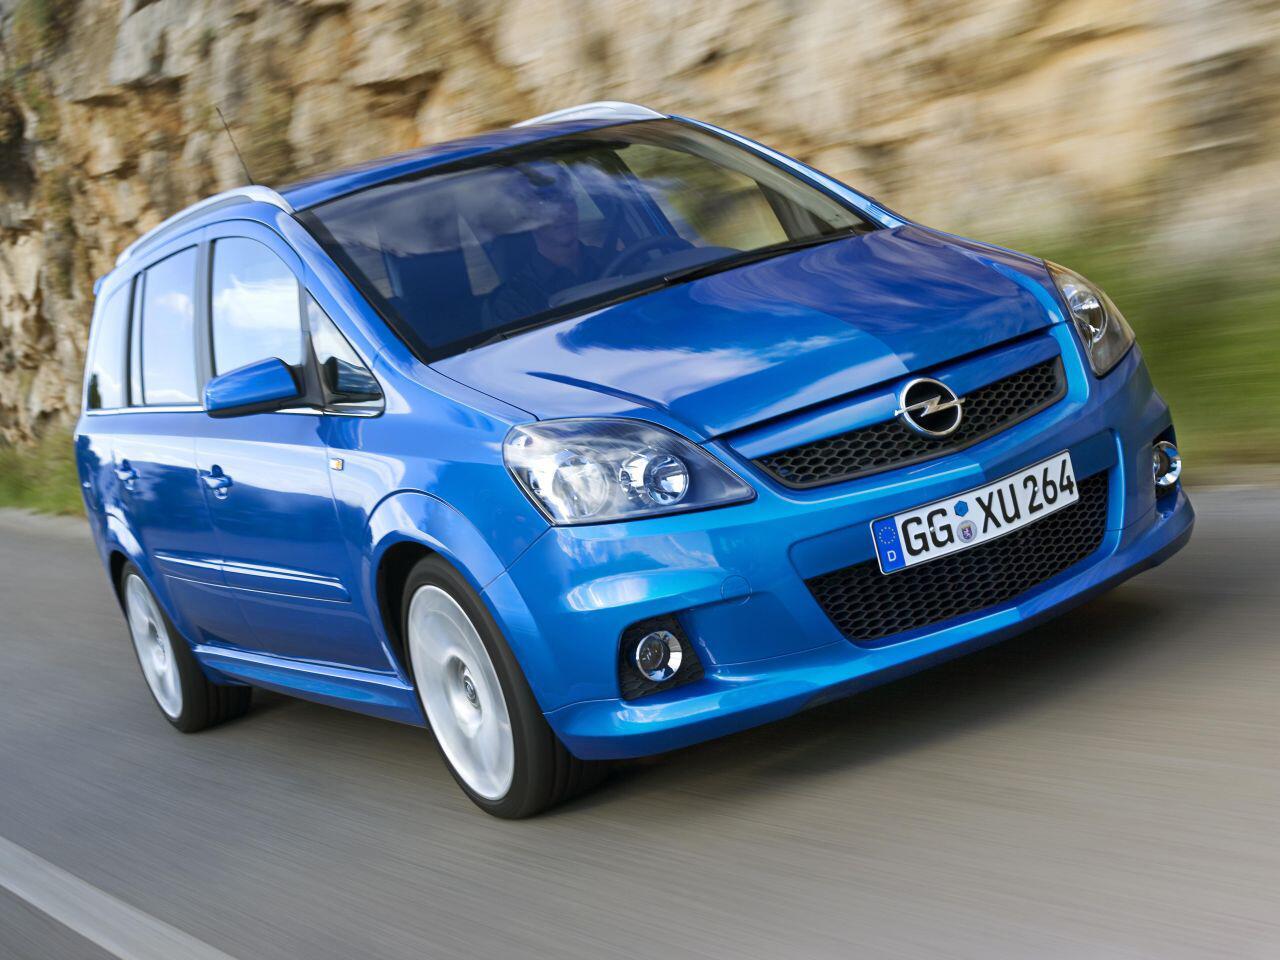 Bild zu Opel Zafira B